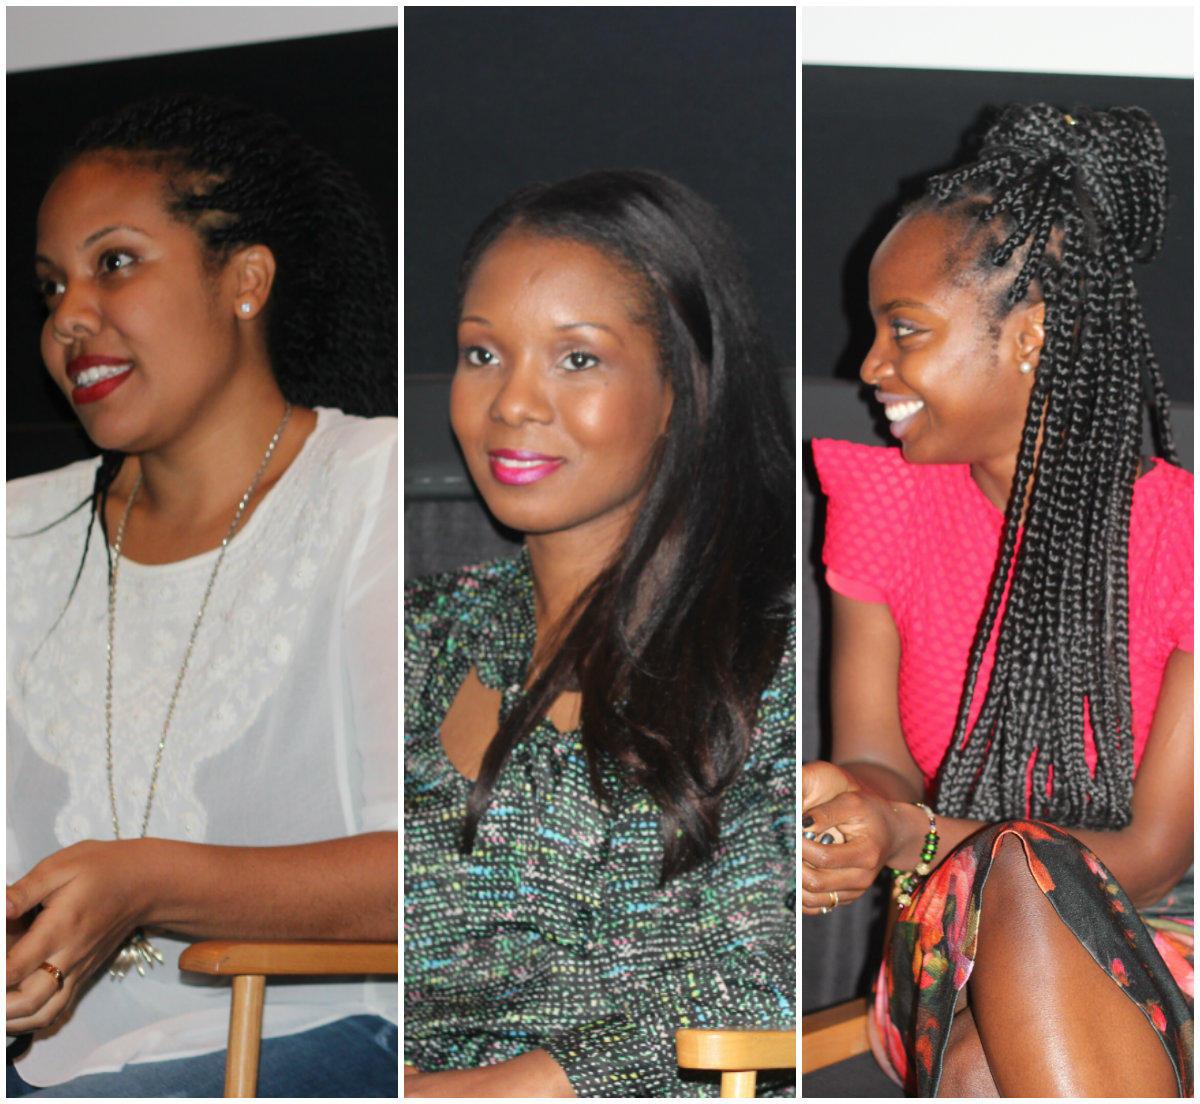 From L to R: NICOLE AMARTEIFO: Executve Producer, Director,Creator and Writer, MILLIE MONYO: Executive Producer MAAMEYAA BOAF: Actress (NanaYaa)